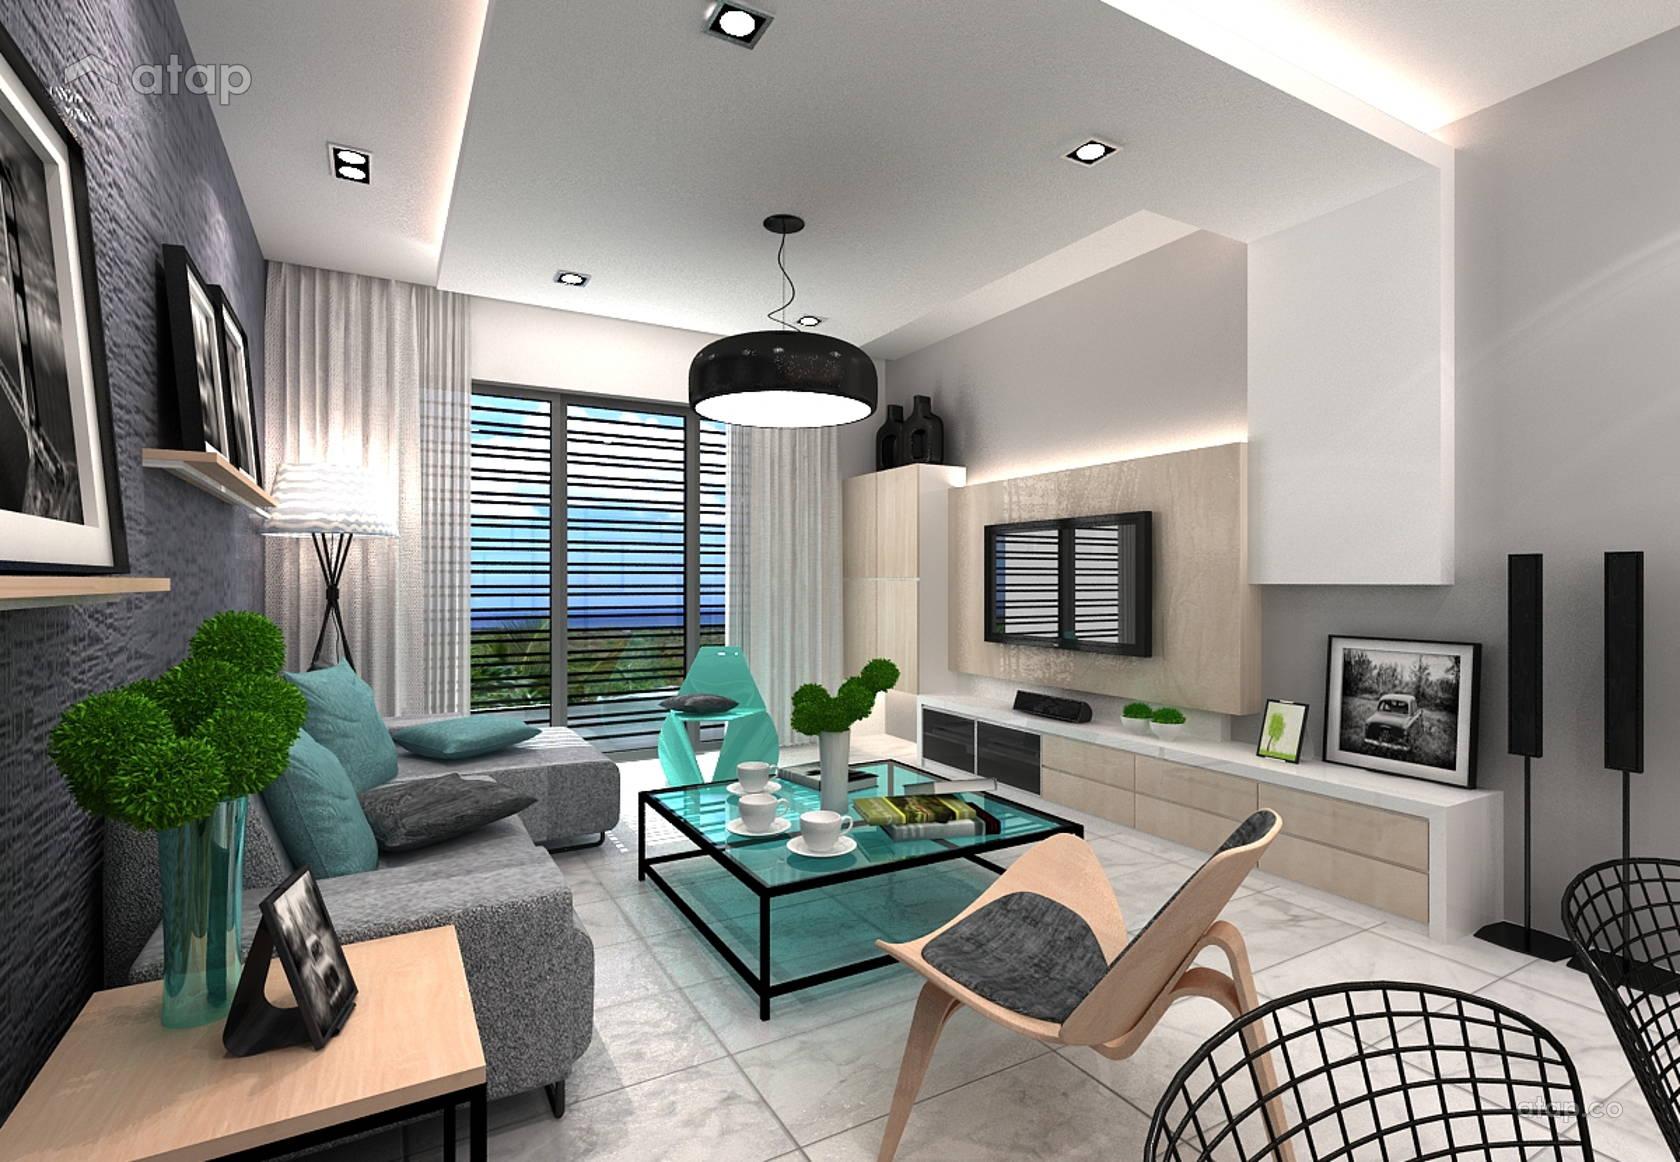 Modern Apartment Design interior design renovation ideas, photos